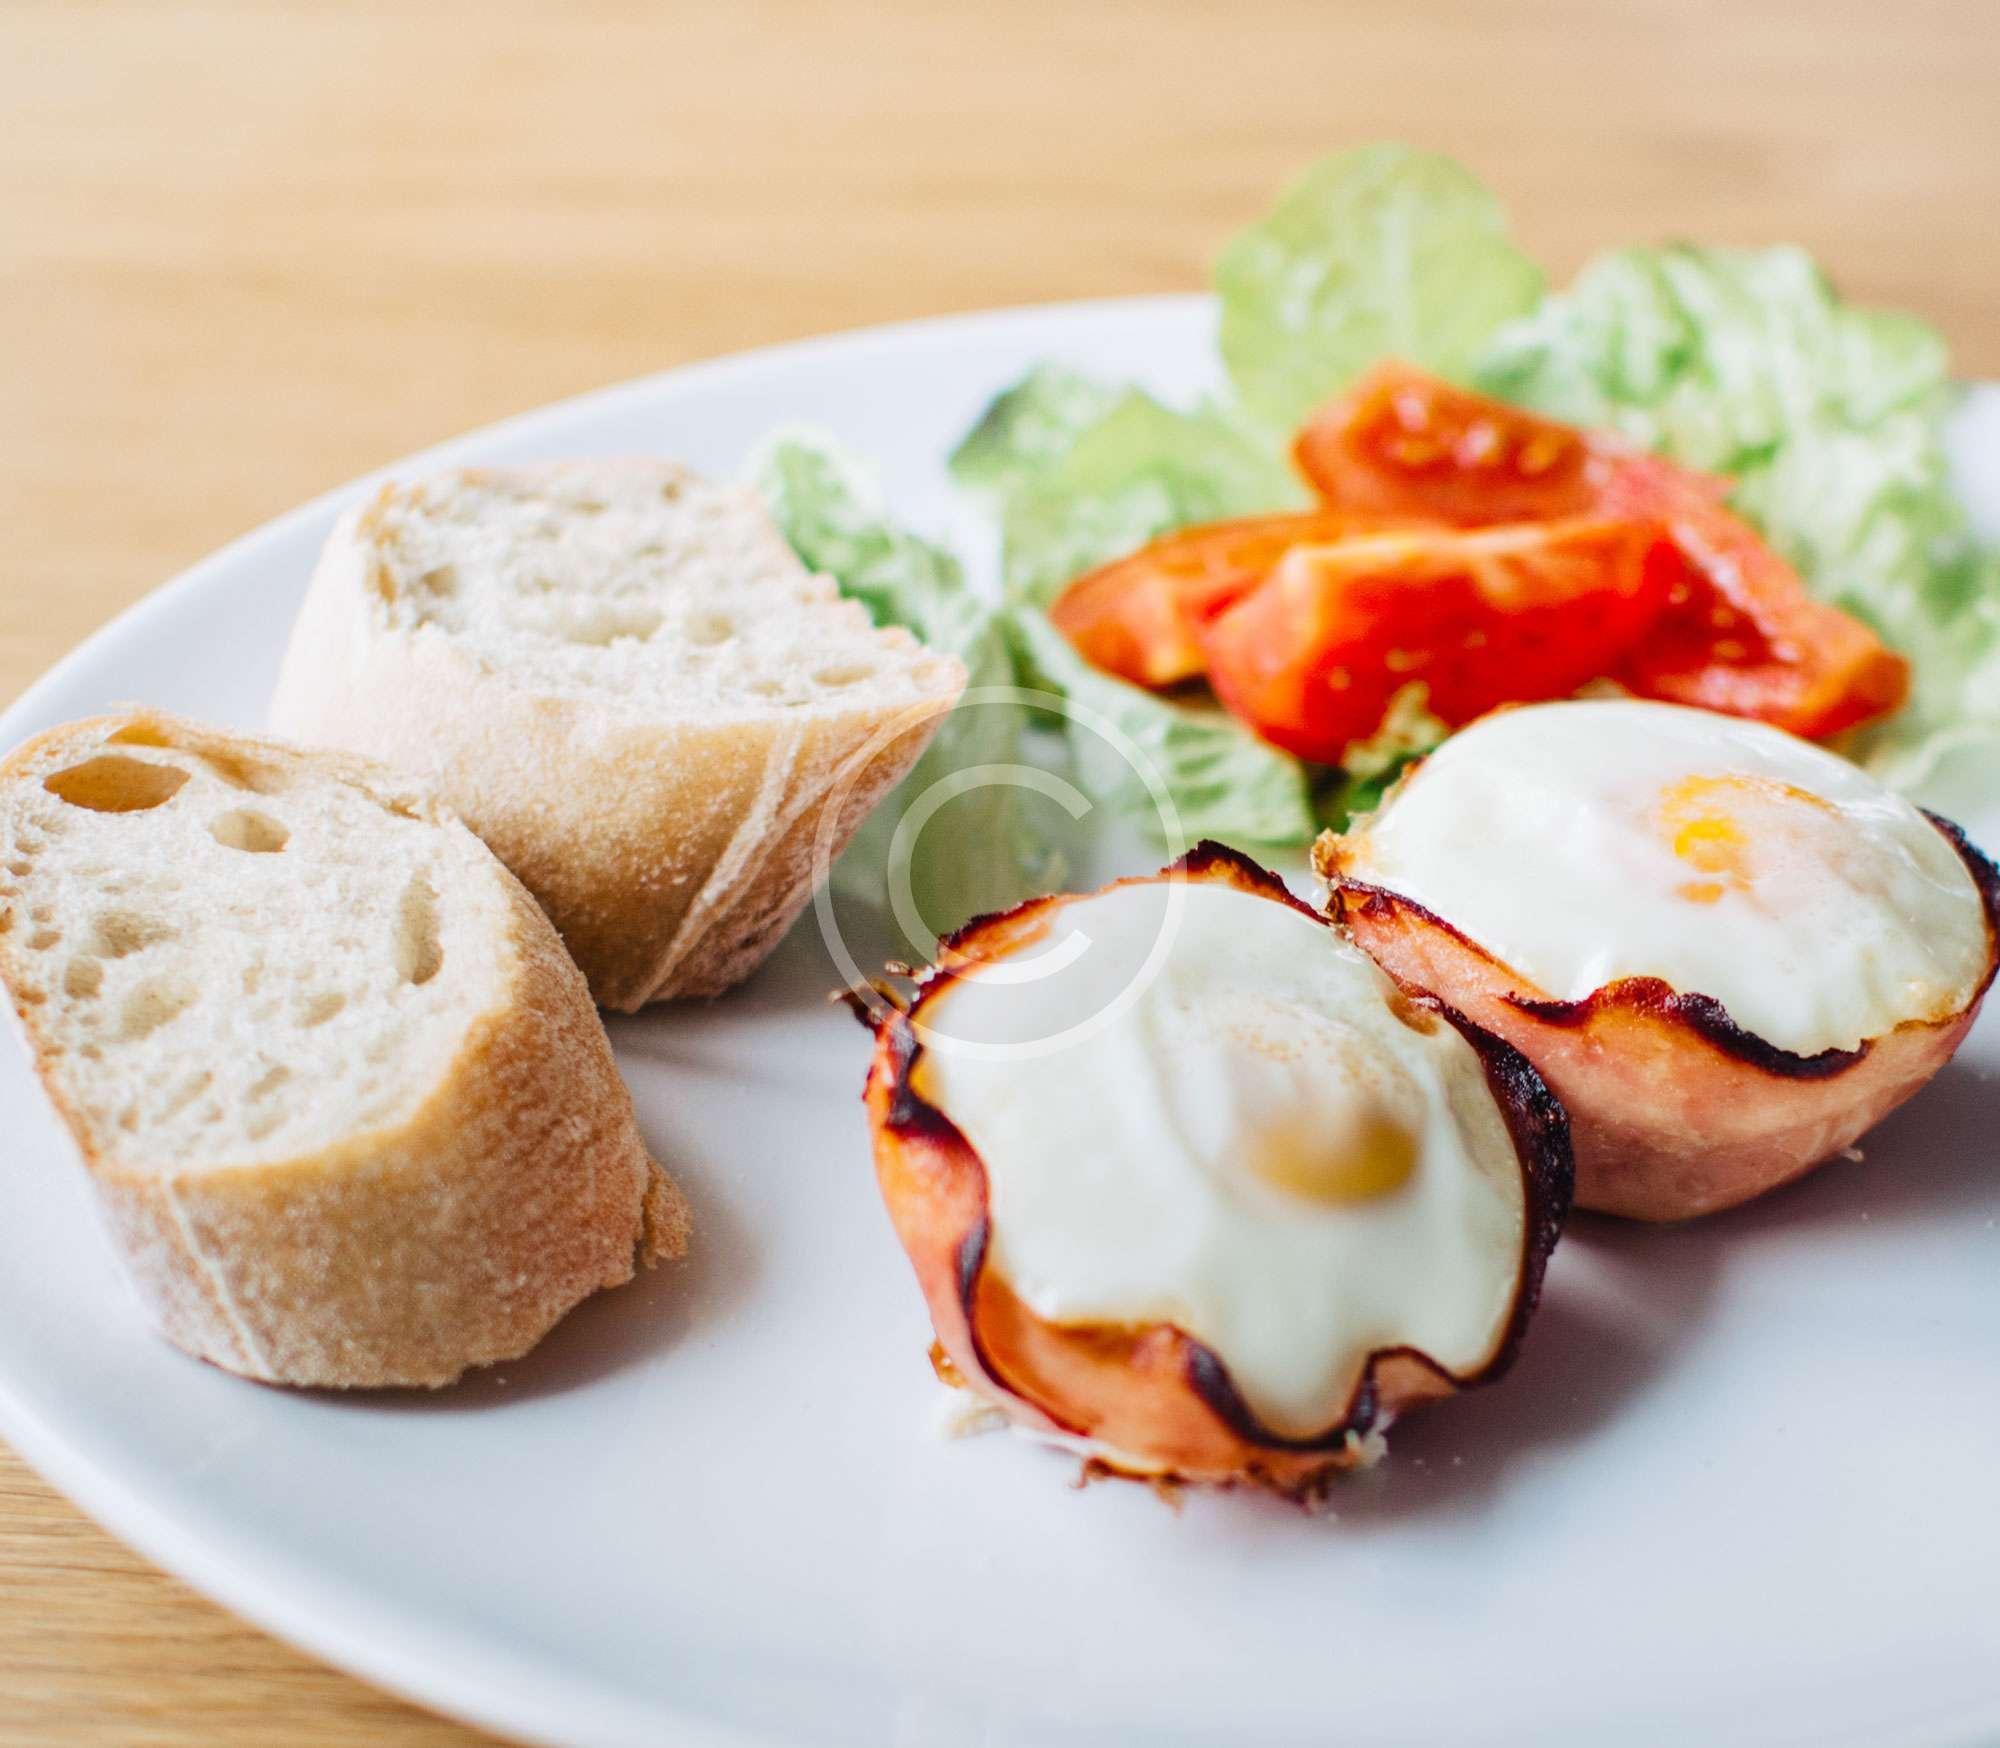 Fried Bacon & Eggs